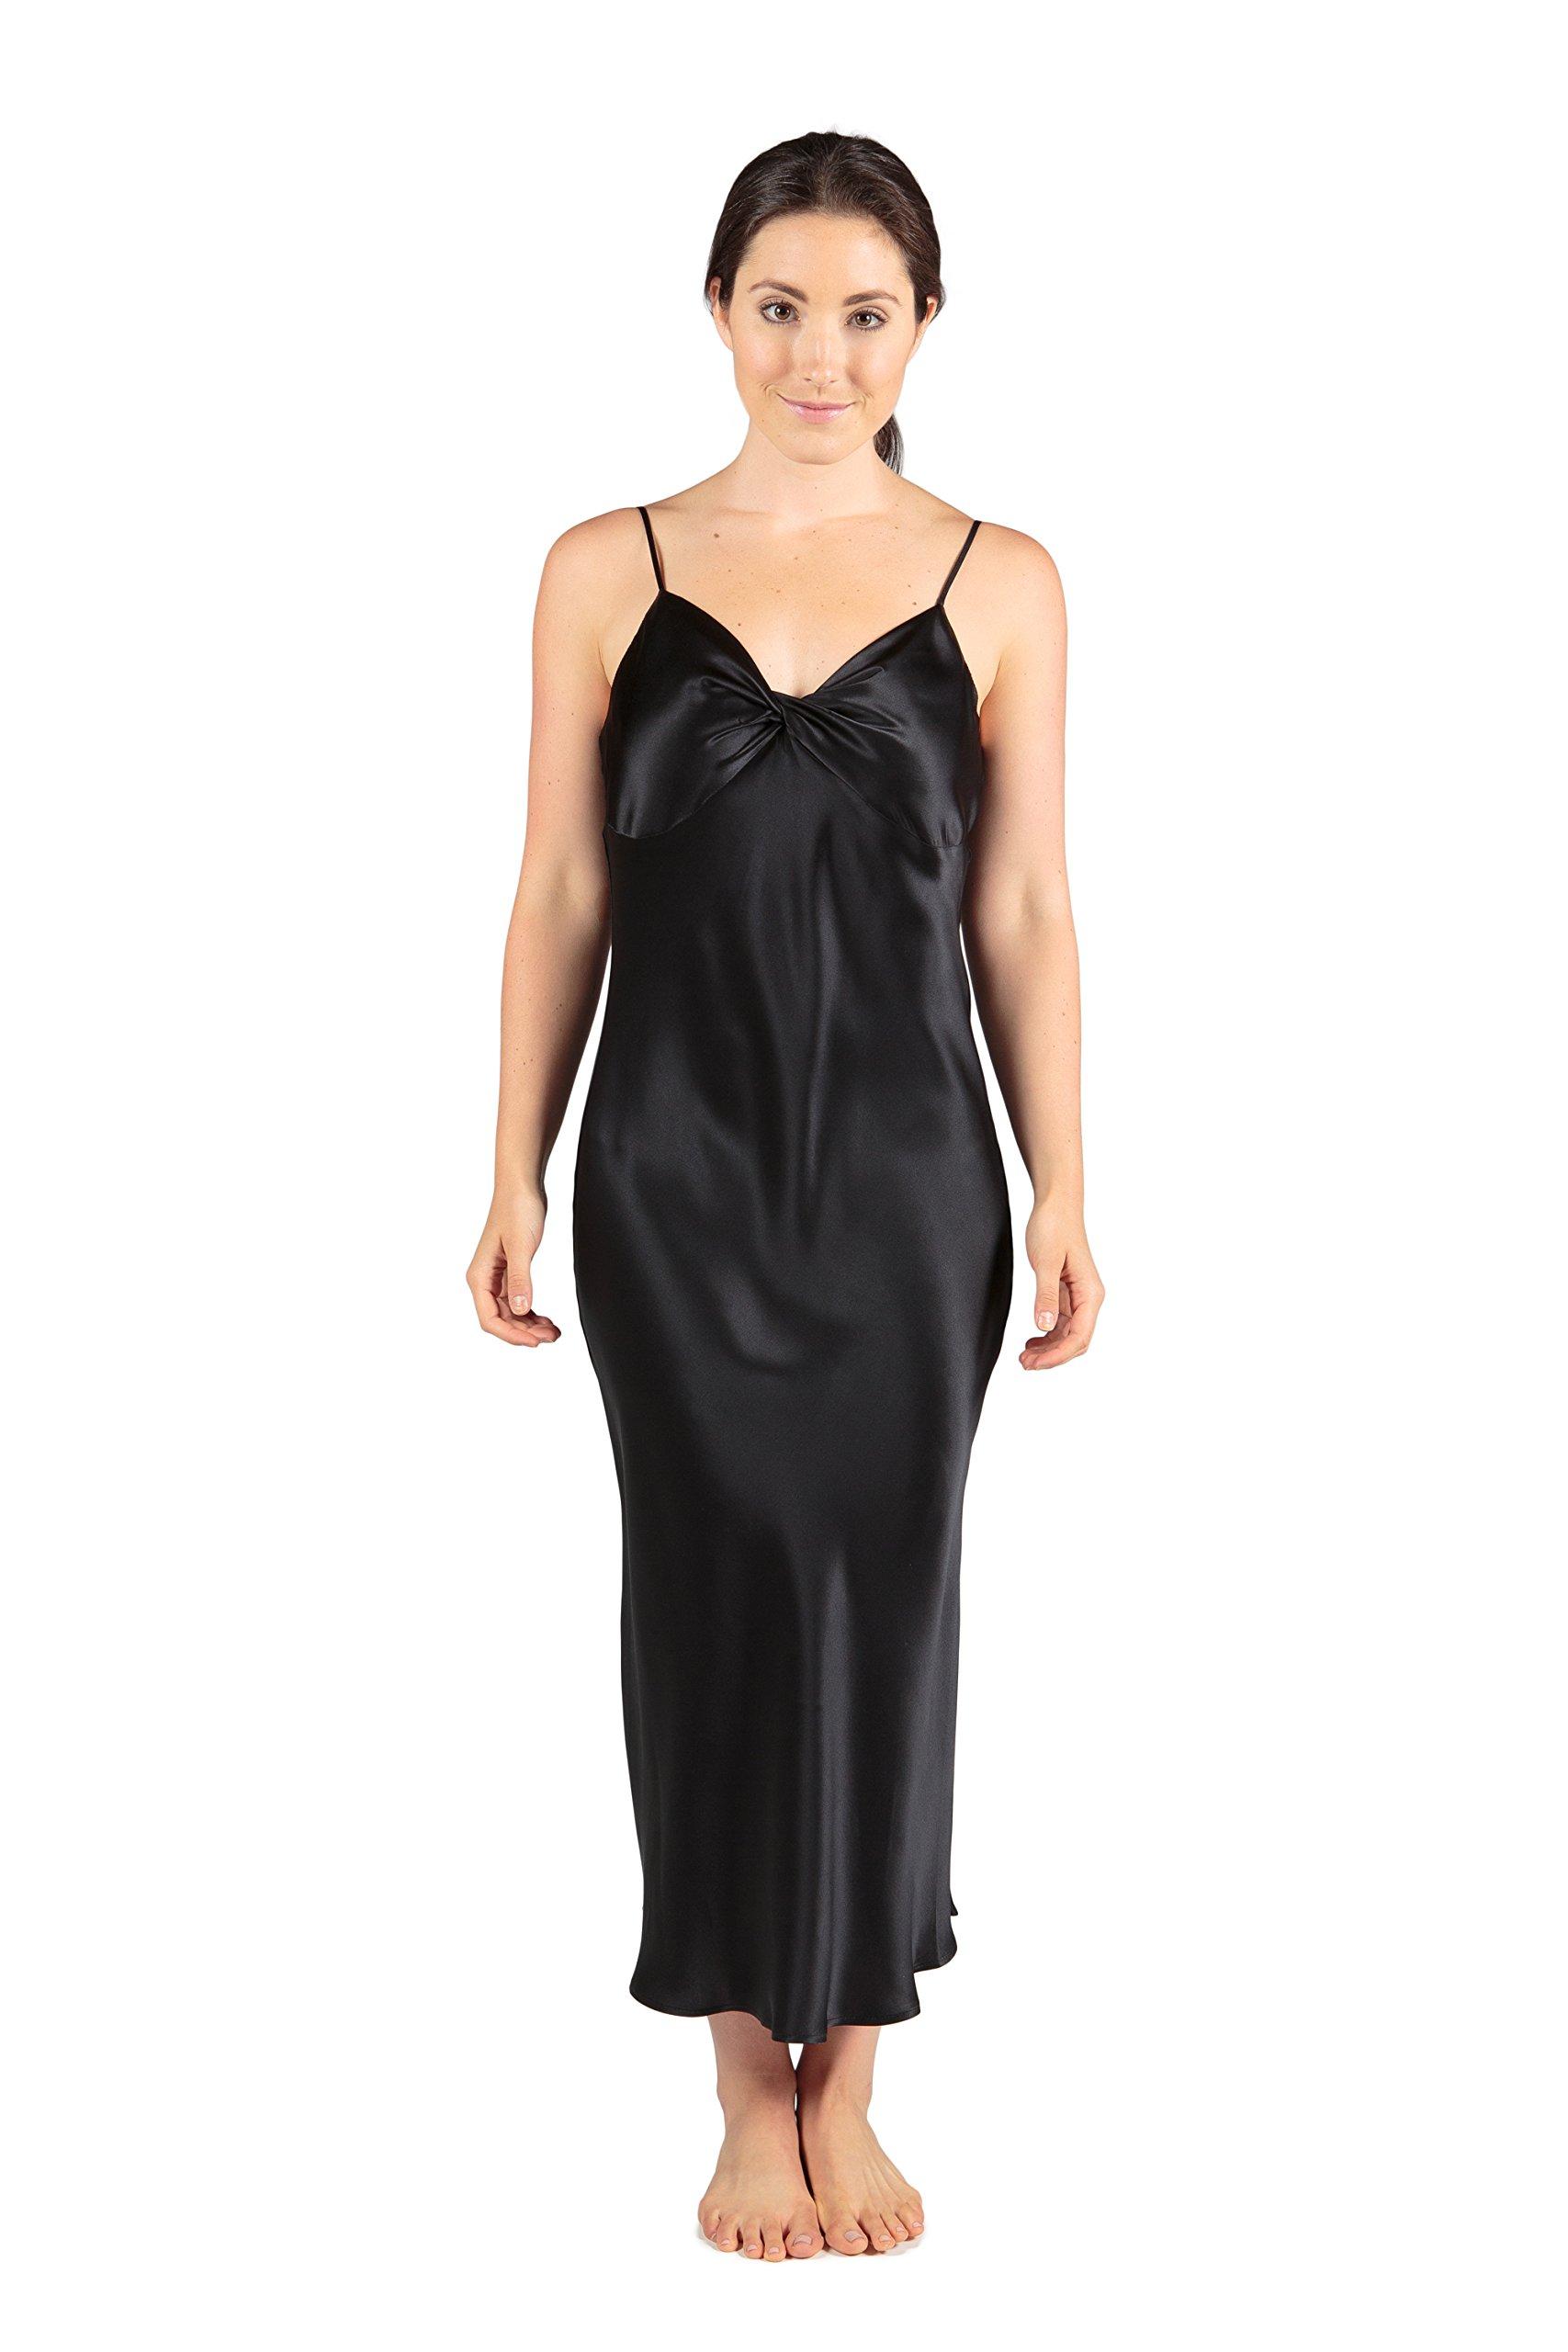 TexereSilk Women's Long Silk Nightgown (Black, Medium) Best Gifts for Her WS0401-BLK-M